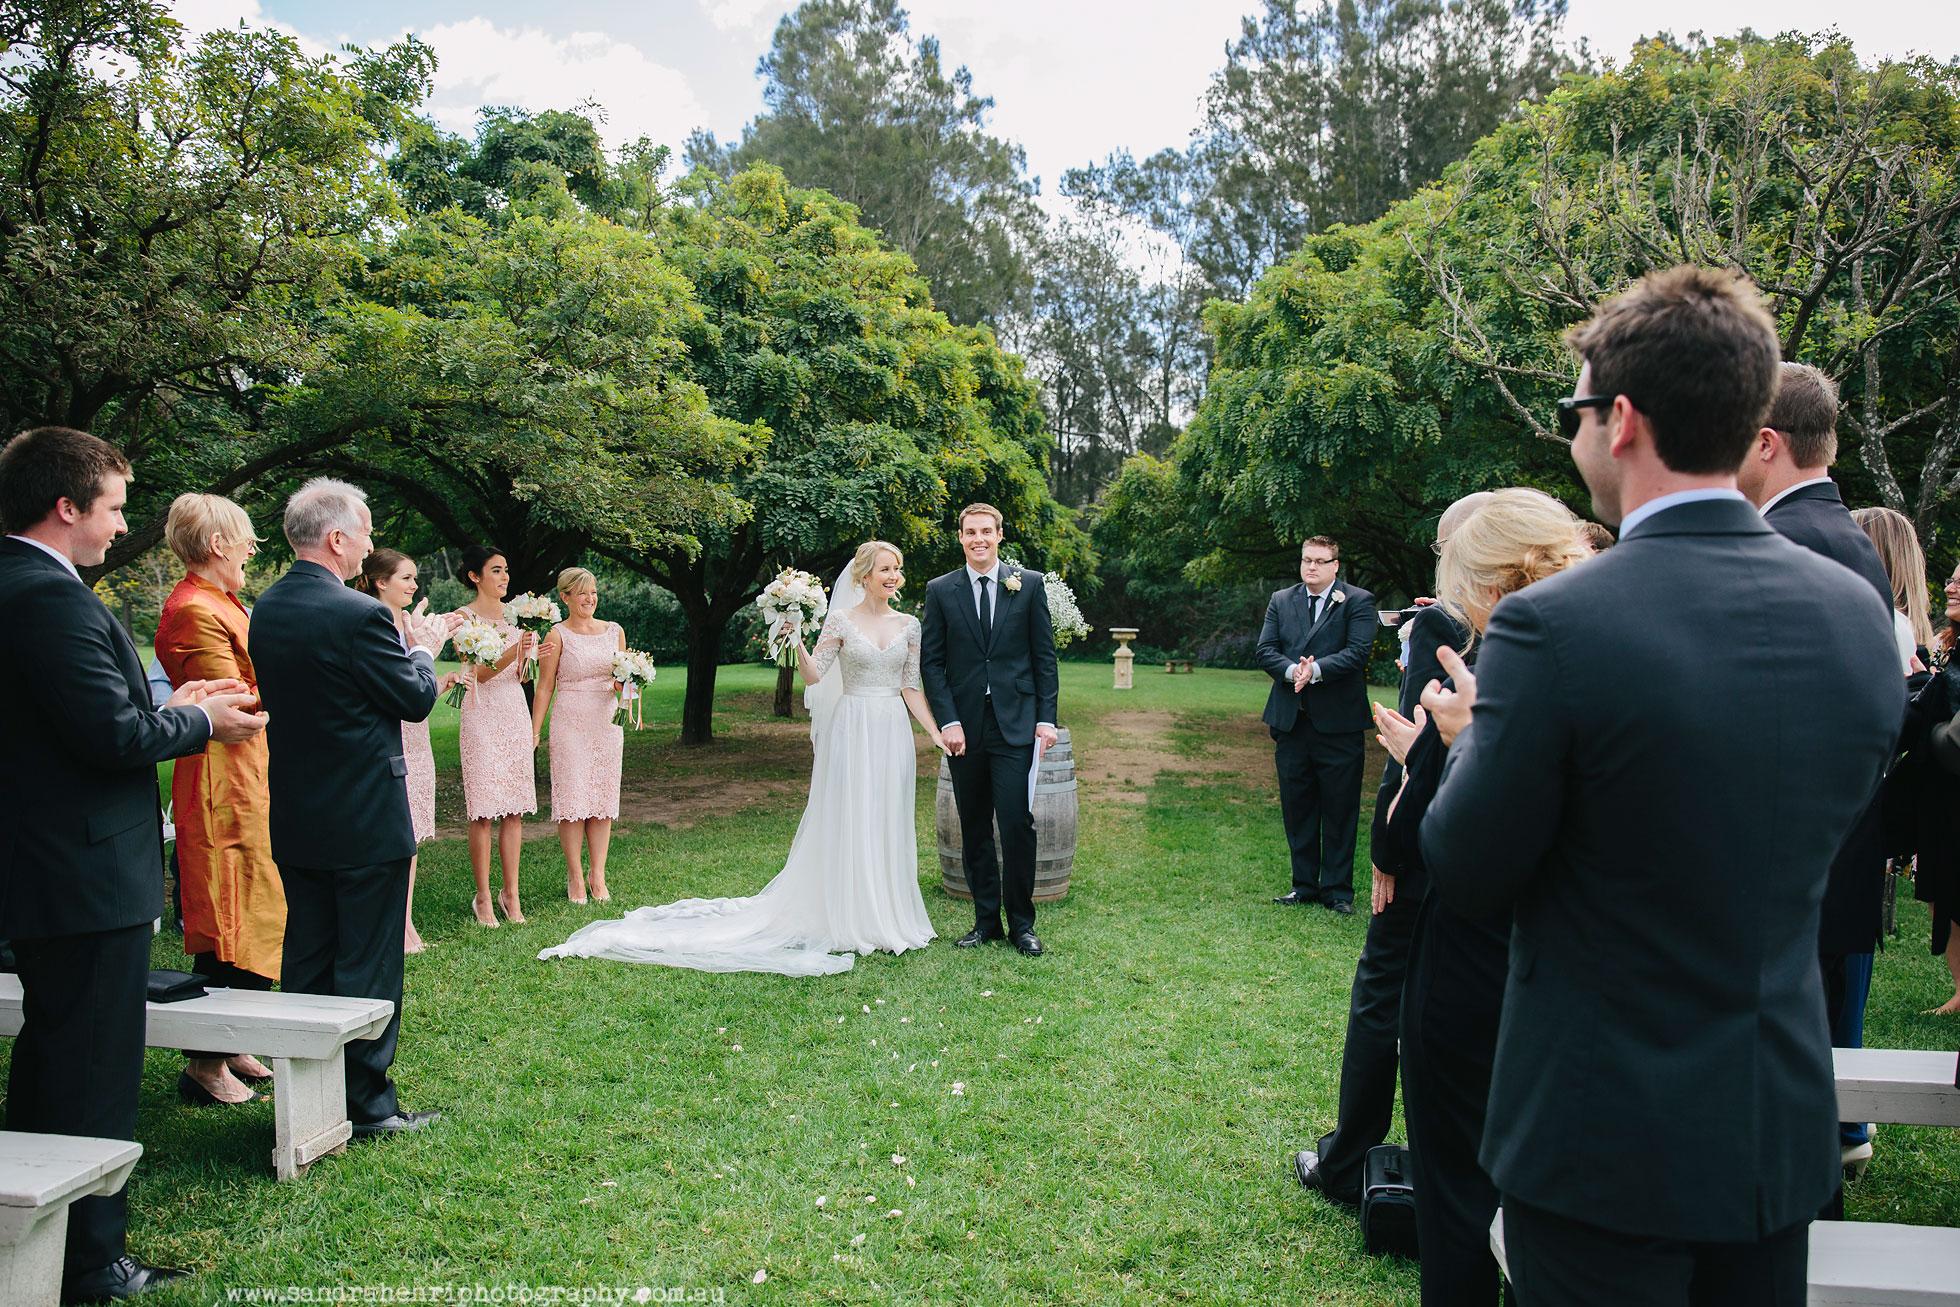 Roberts-Restaurant-garden-wedding-images-20.jpg